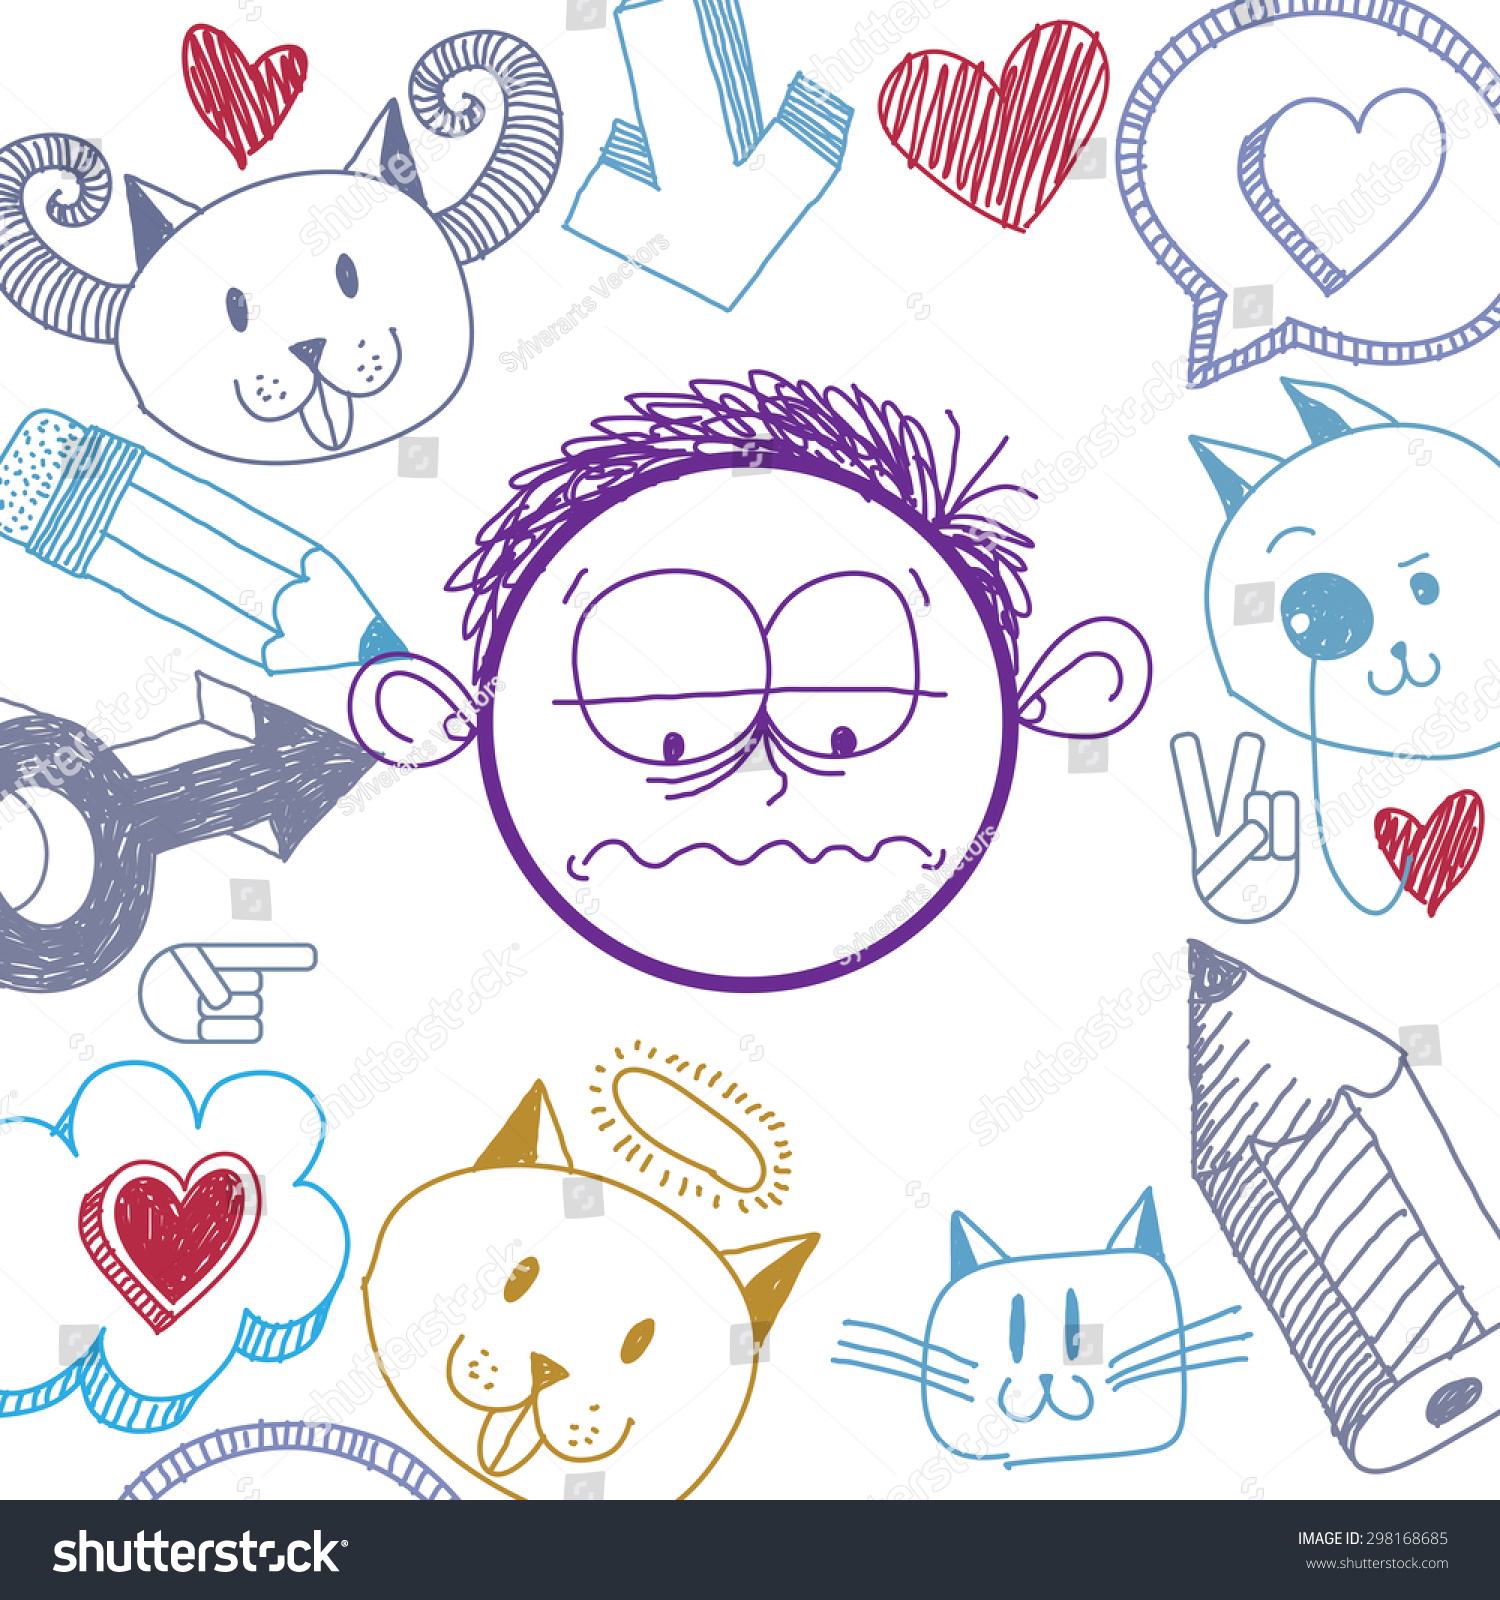 Vector hand drawn cartoon sad boy education theme graphic design elements isolated social conversation